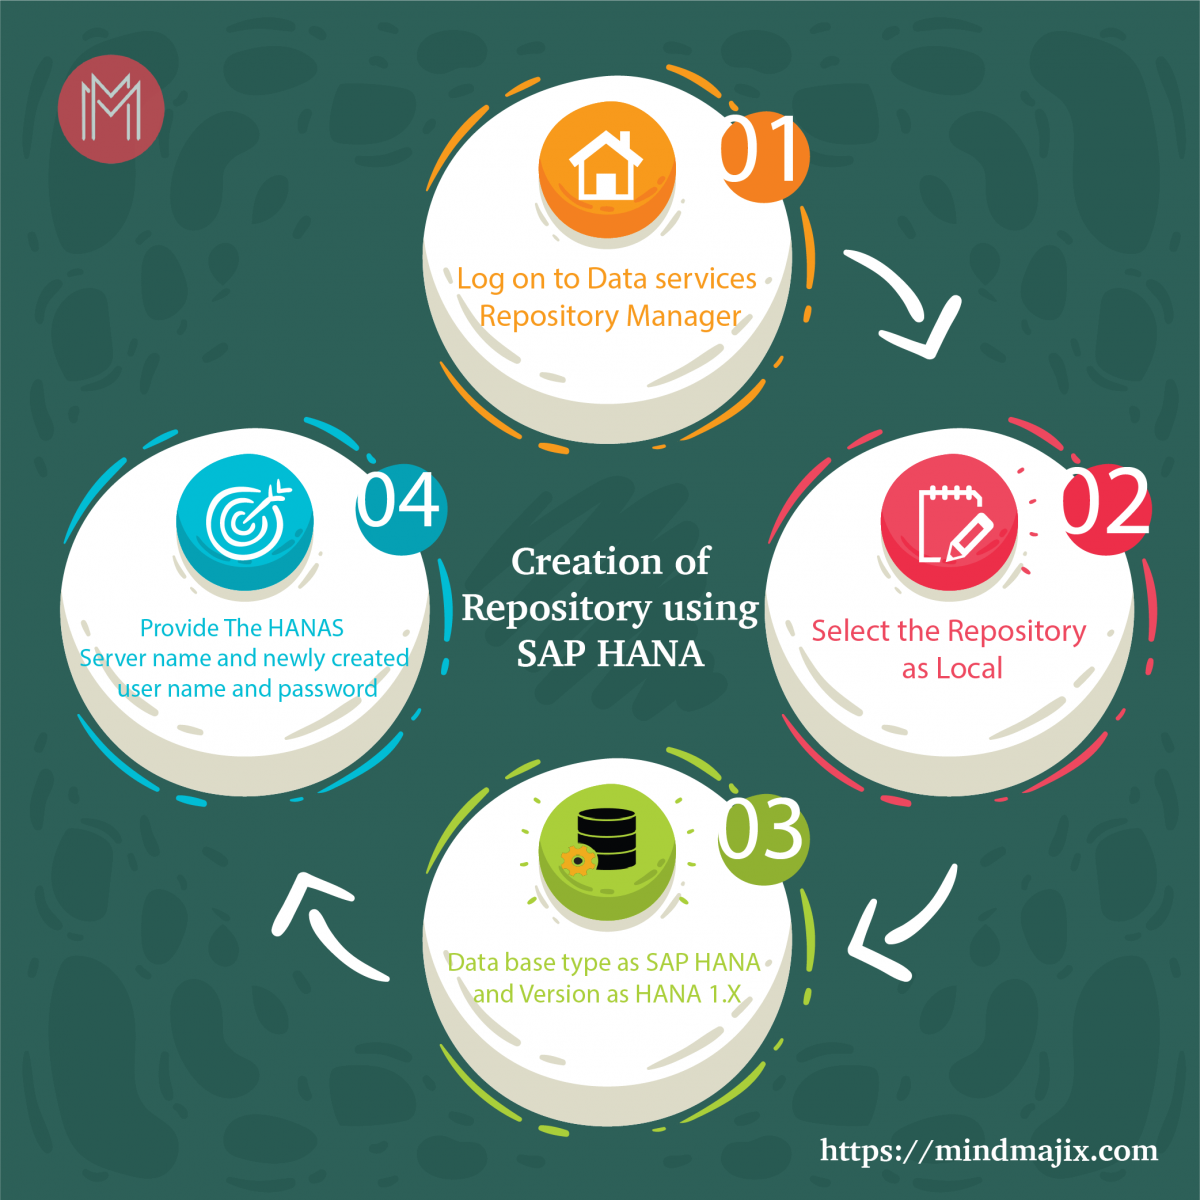 Creation of Repository using SAP HANA